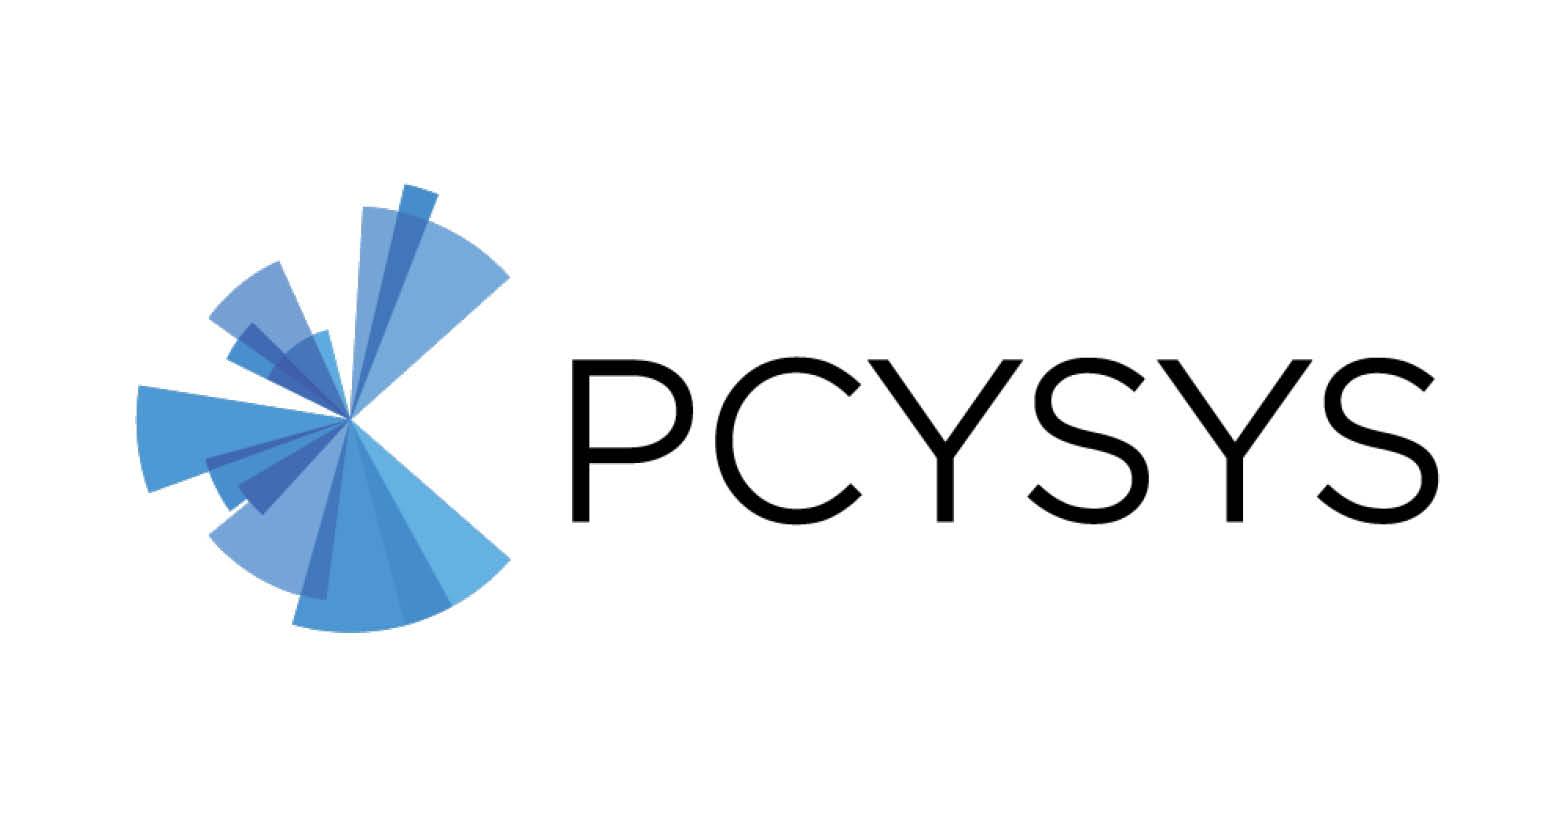 PCYSYS.jpg